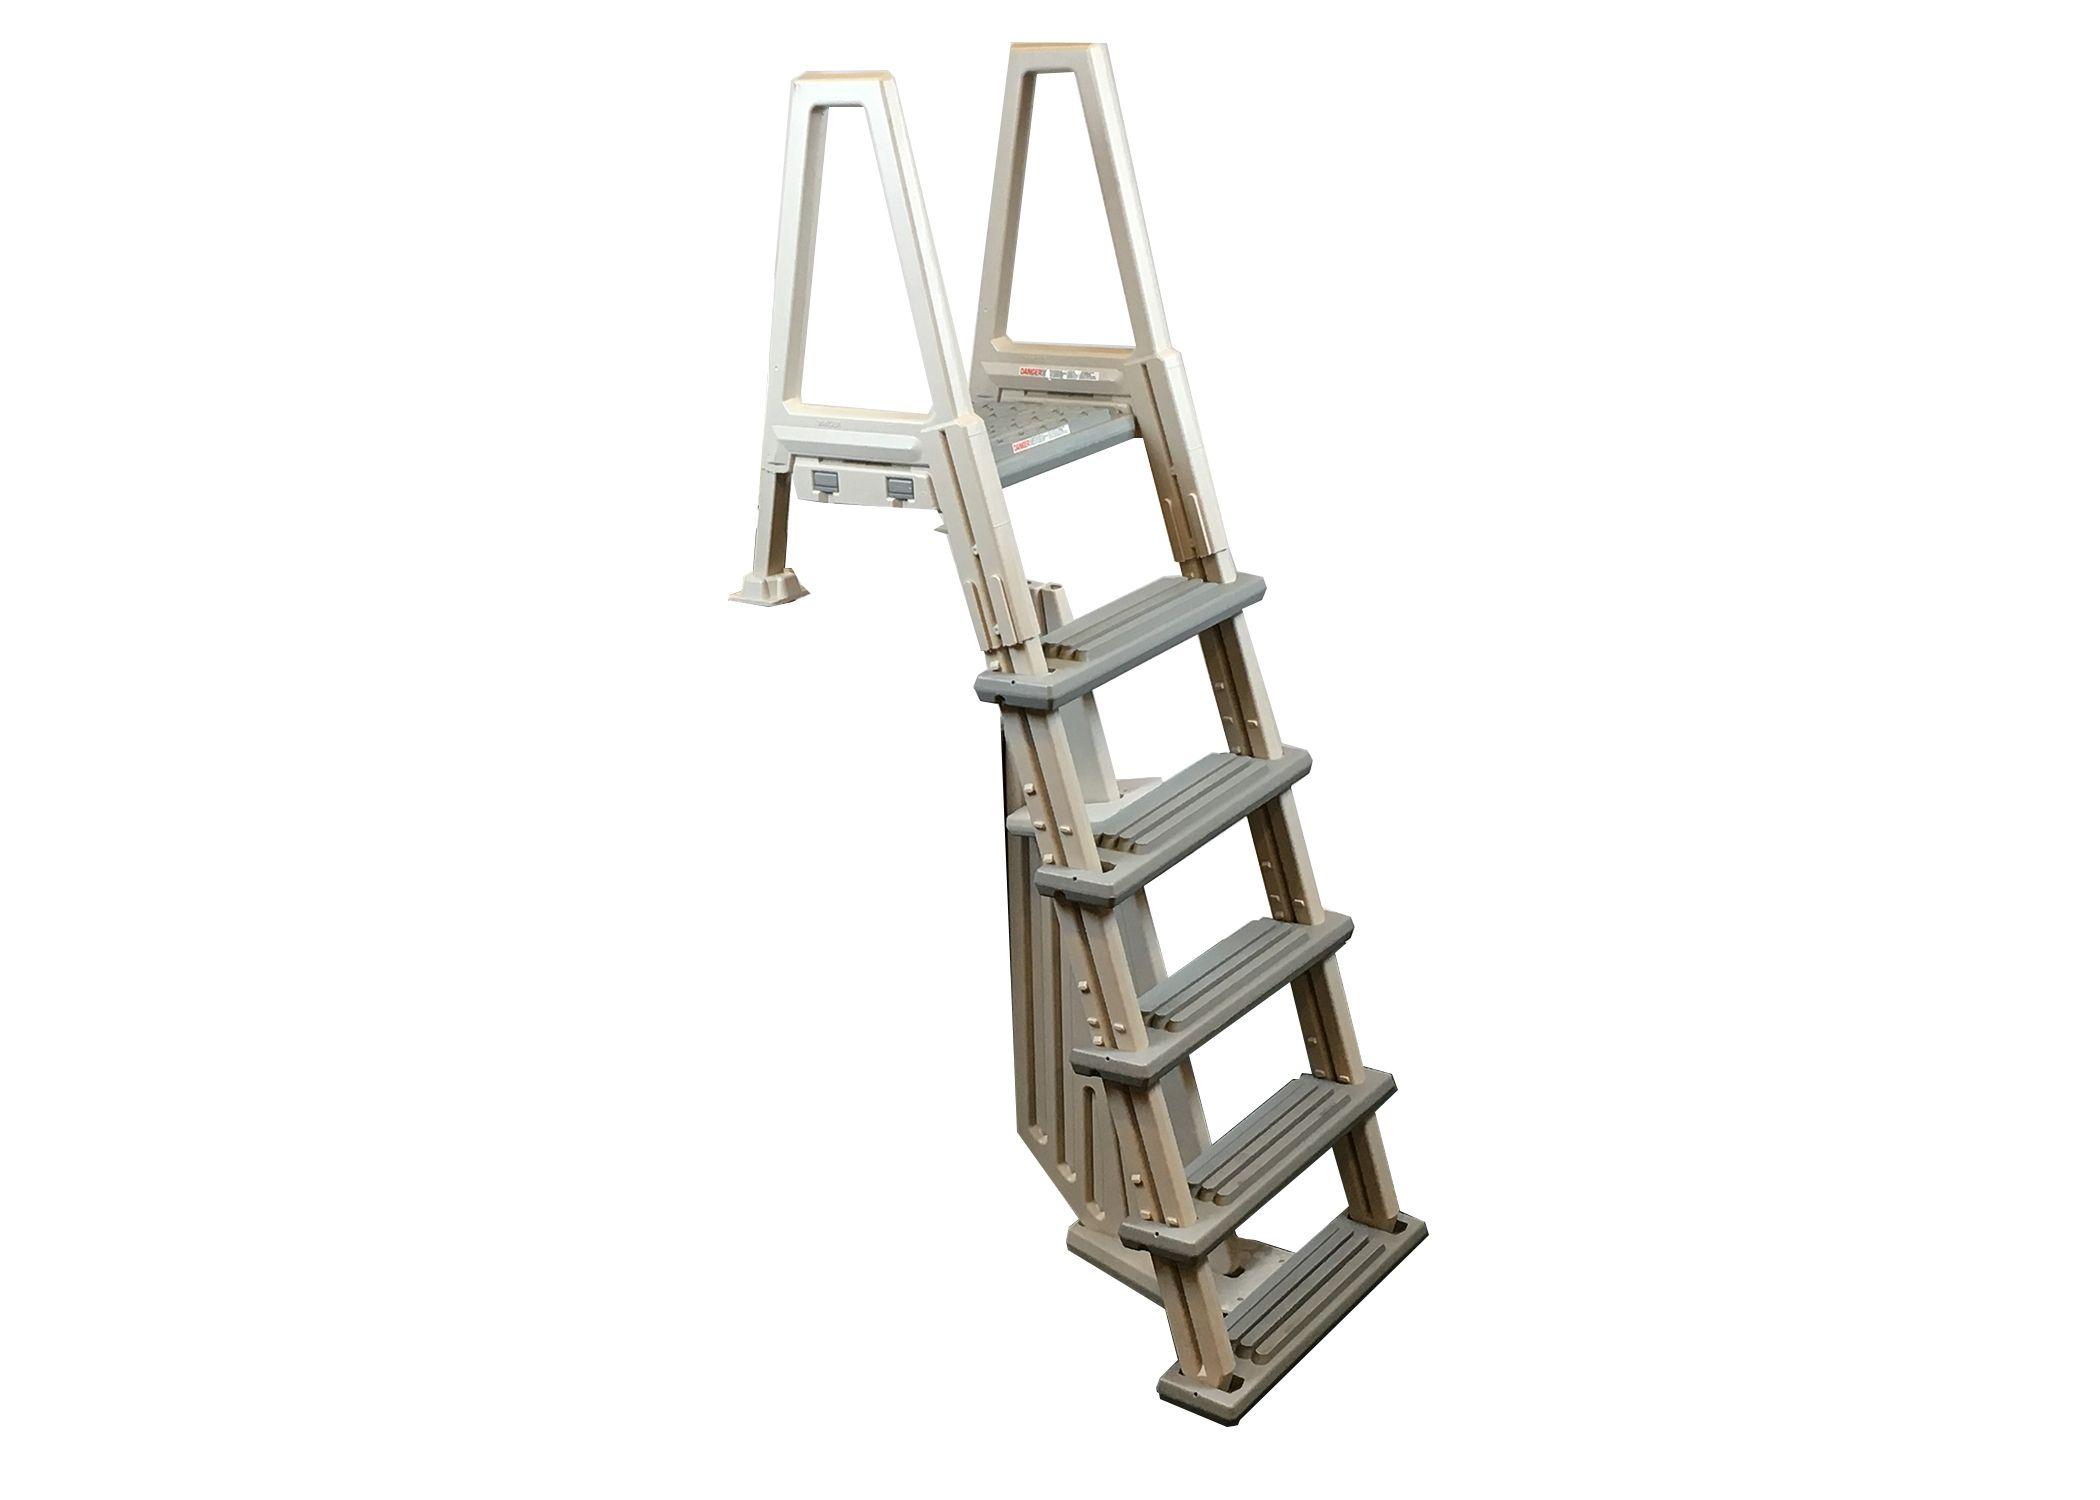 Confer plastics resin abg inpool ladder with barrier